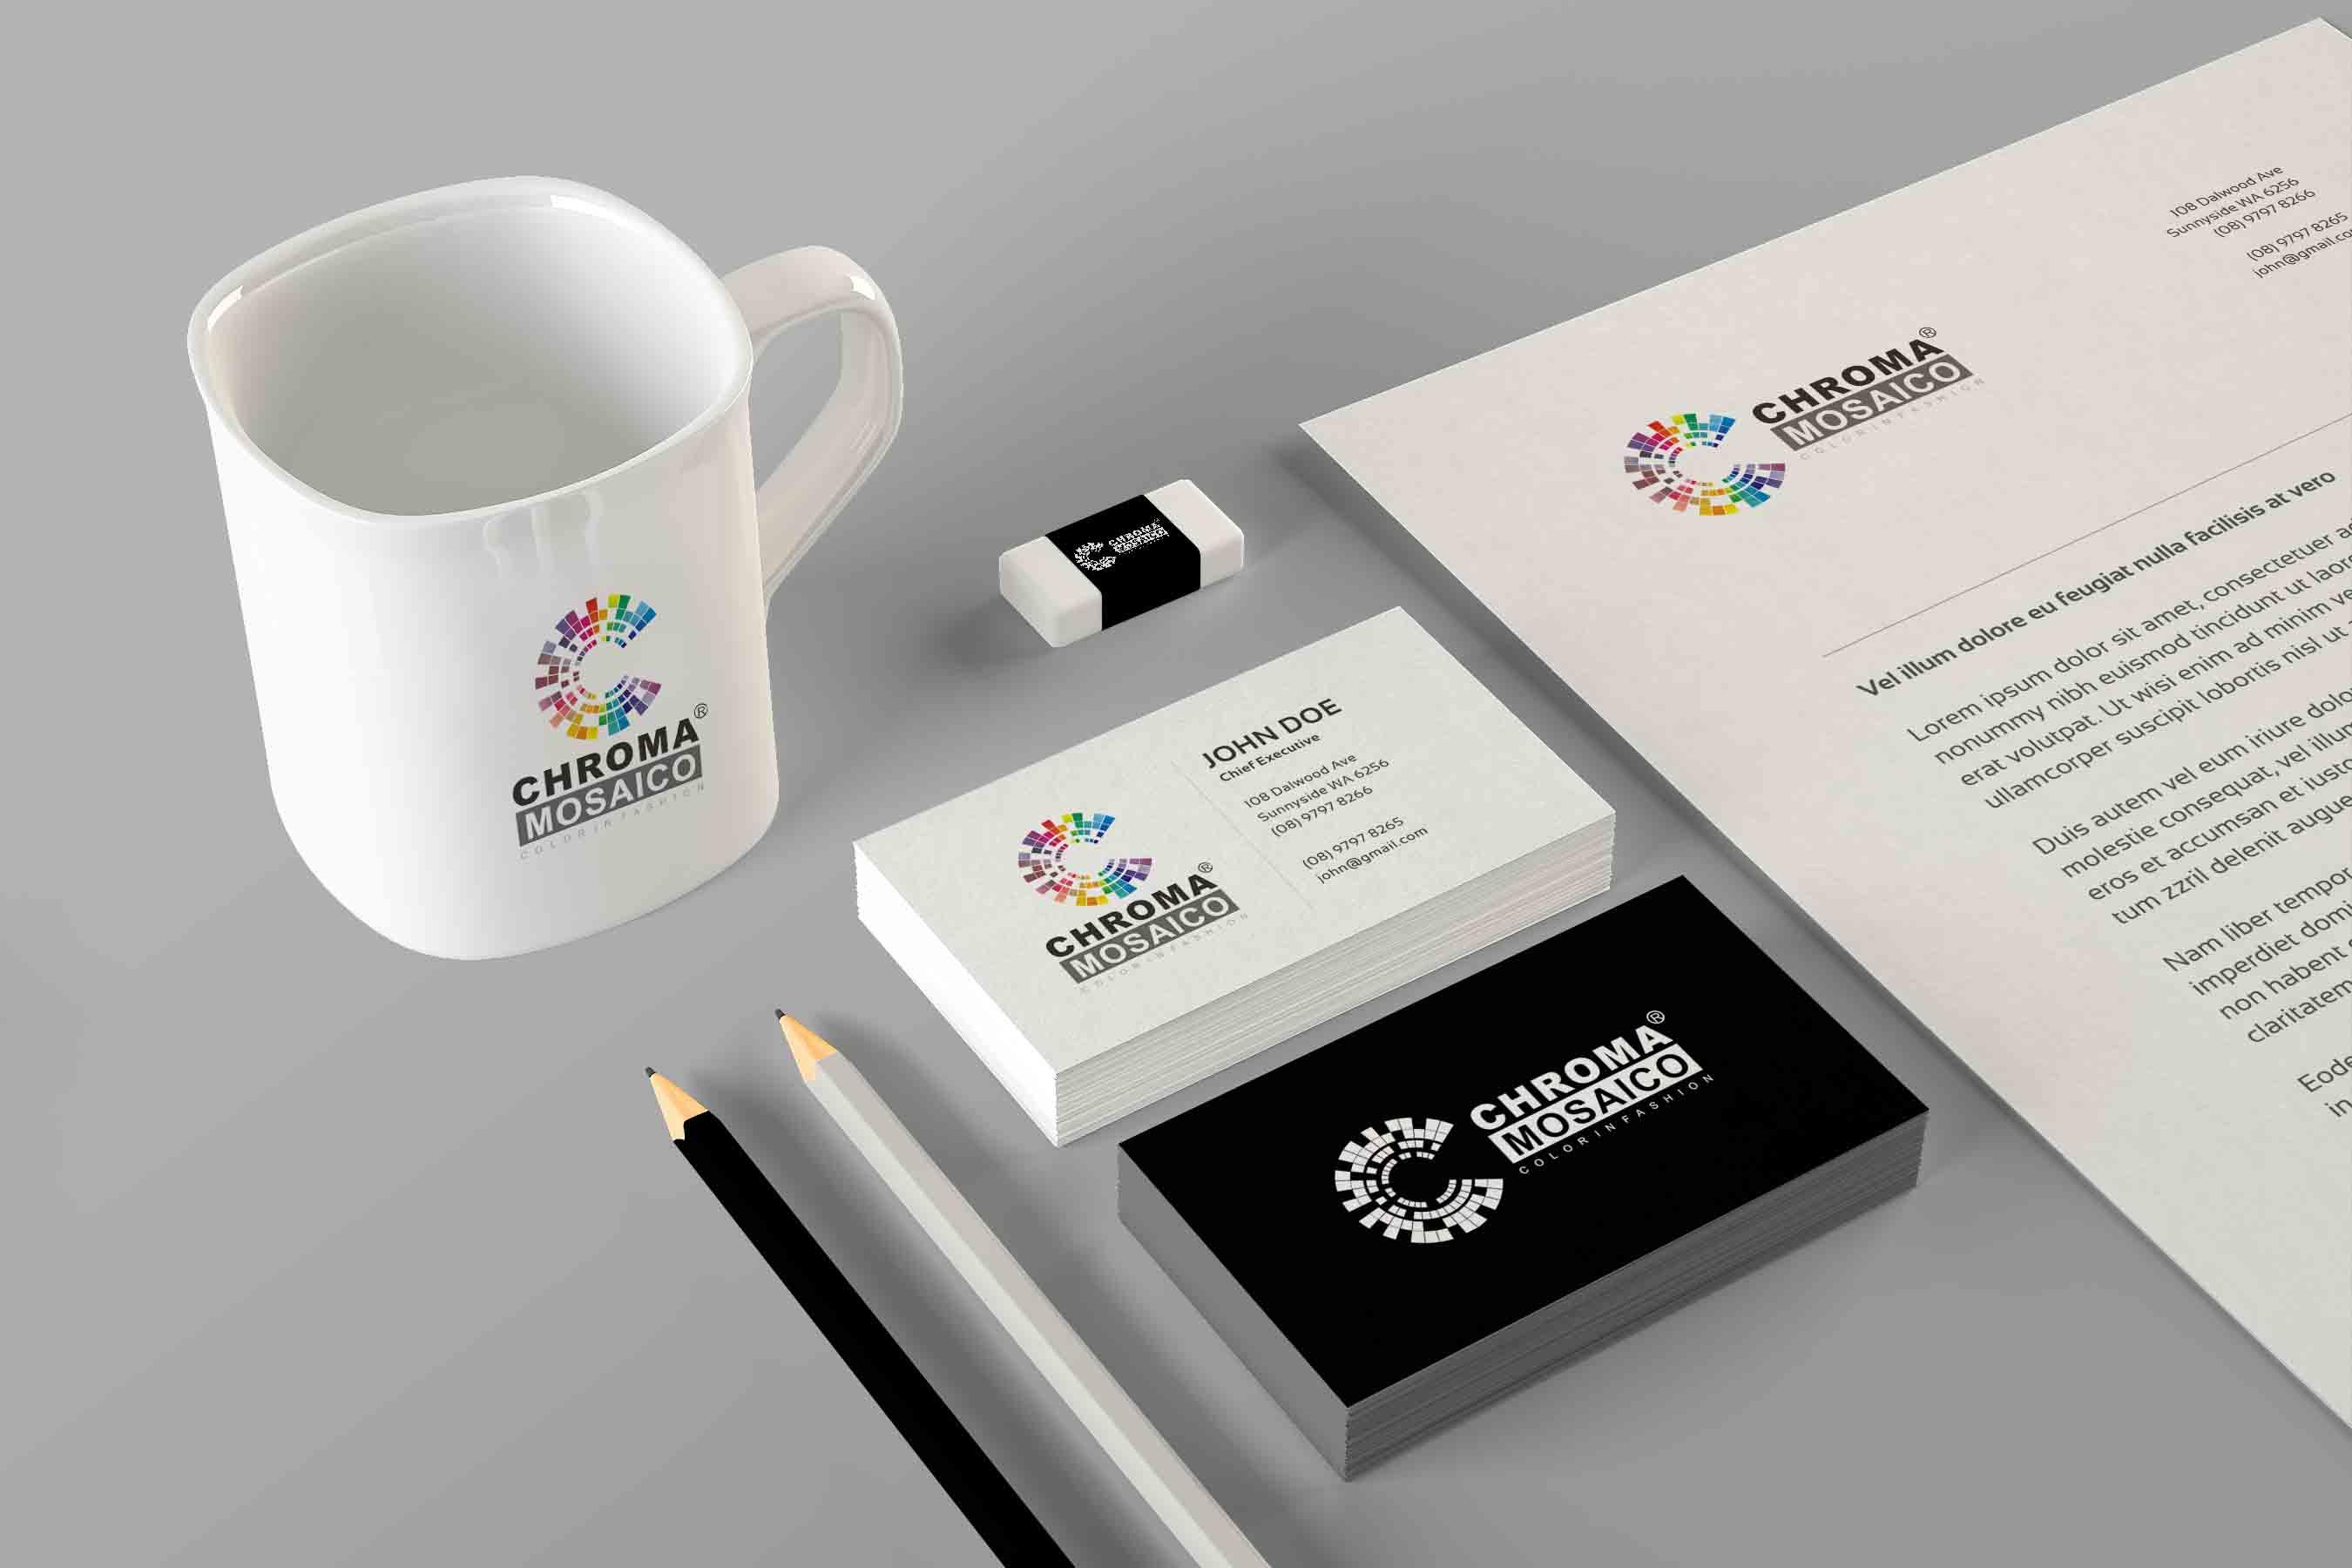 CHROMA 品牌logo设计_2957355_k68威客网